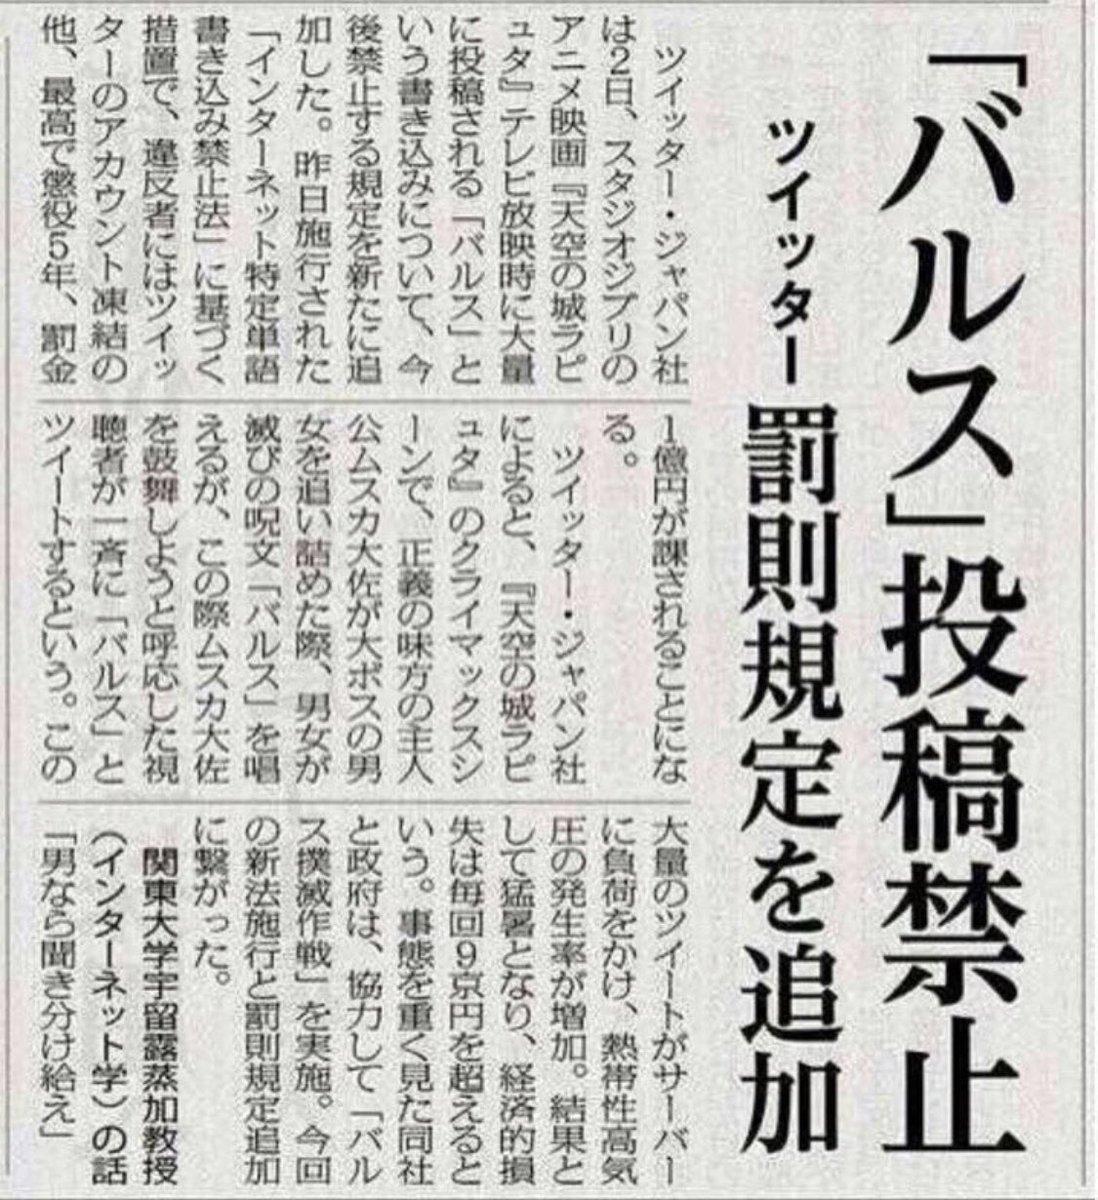 「aa 宮崎駿 バルス」の画像検索結果